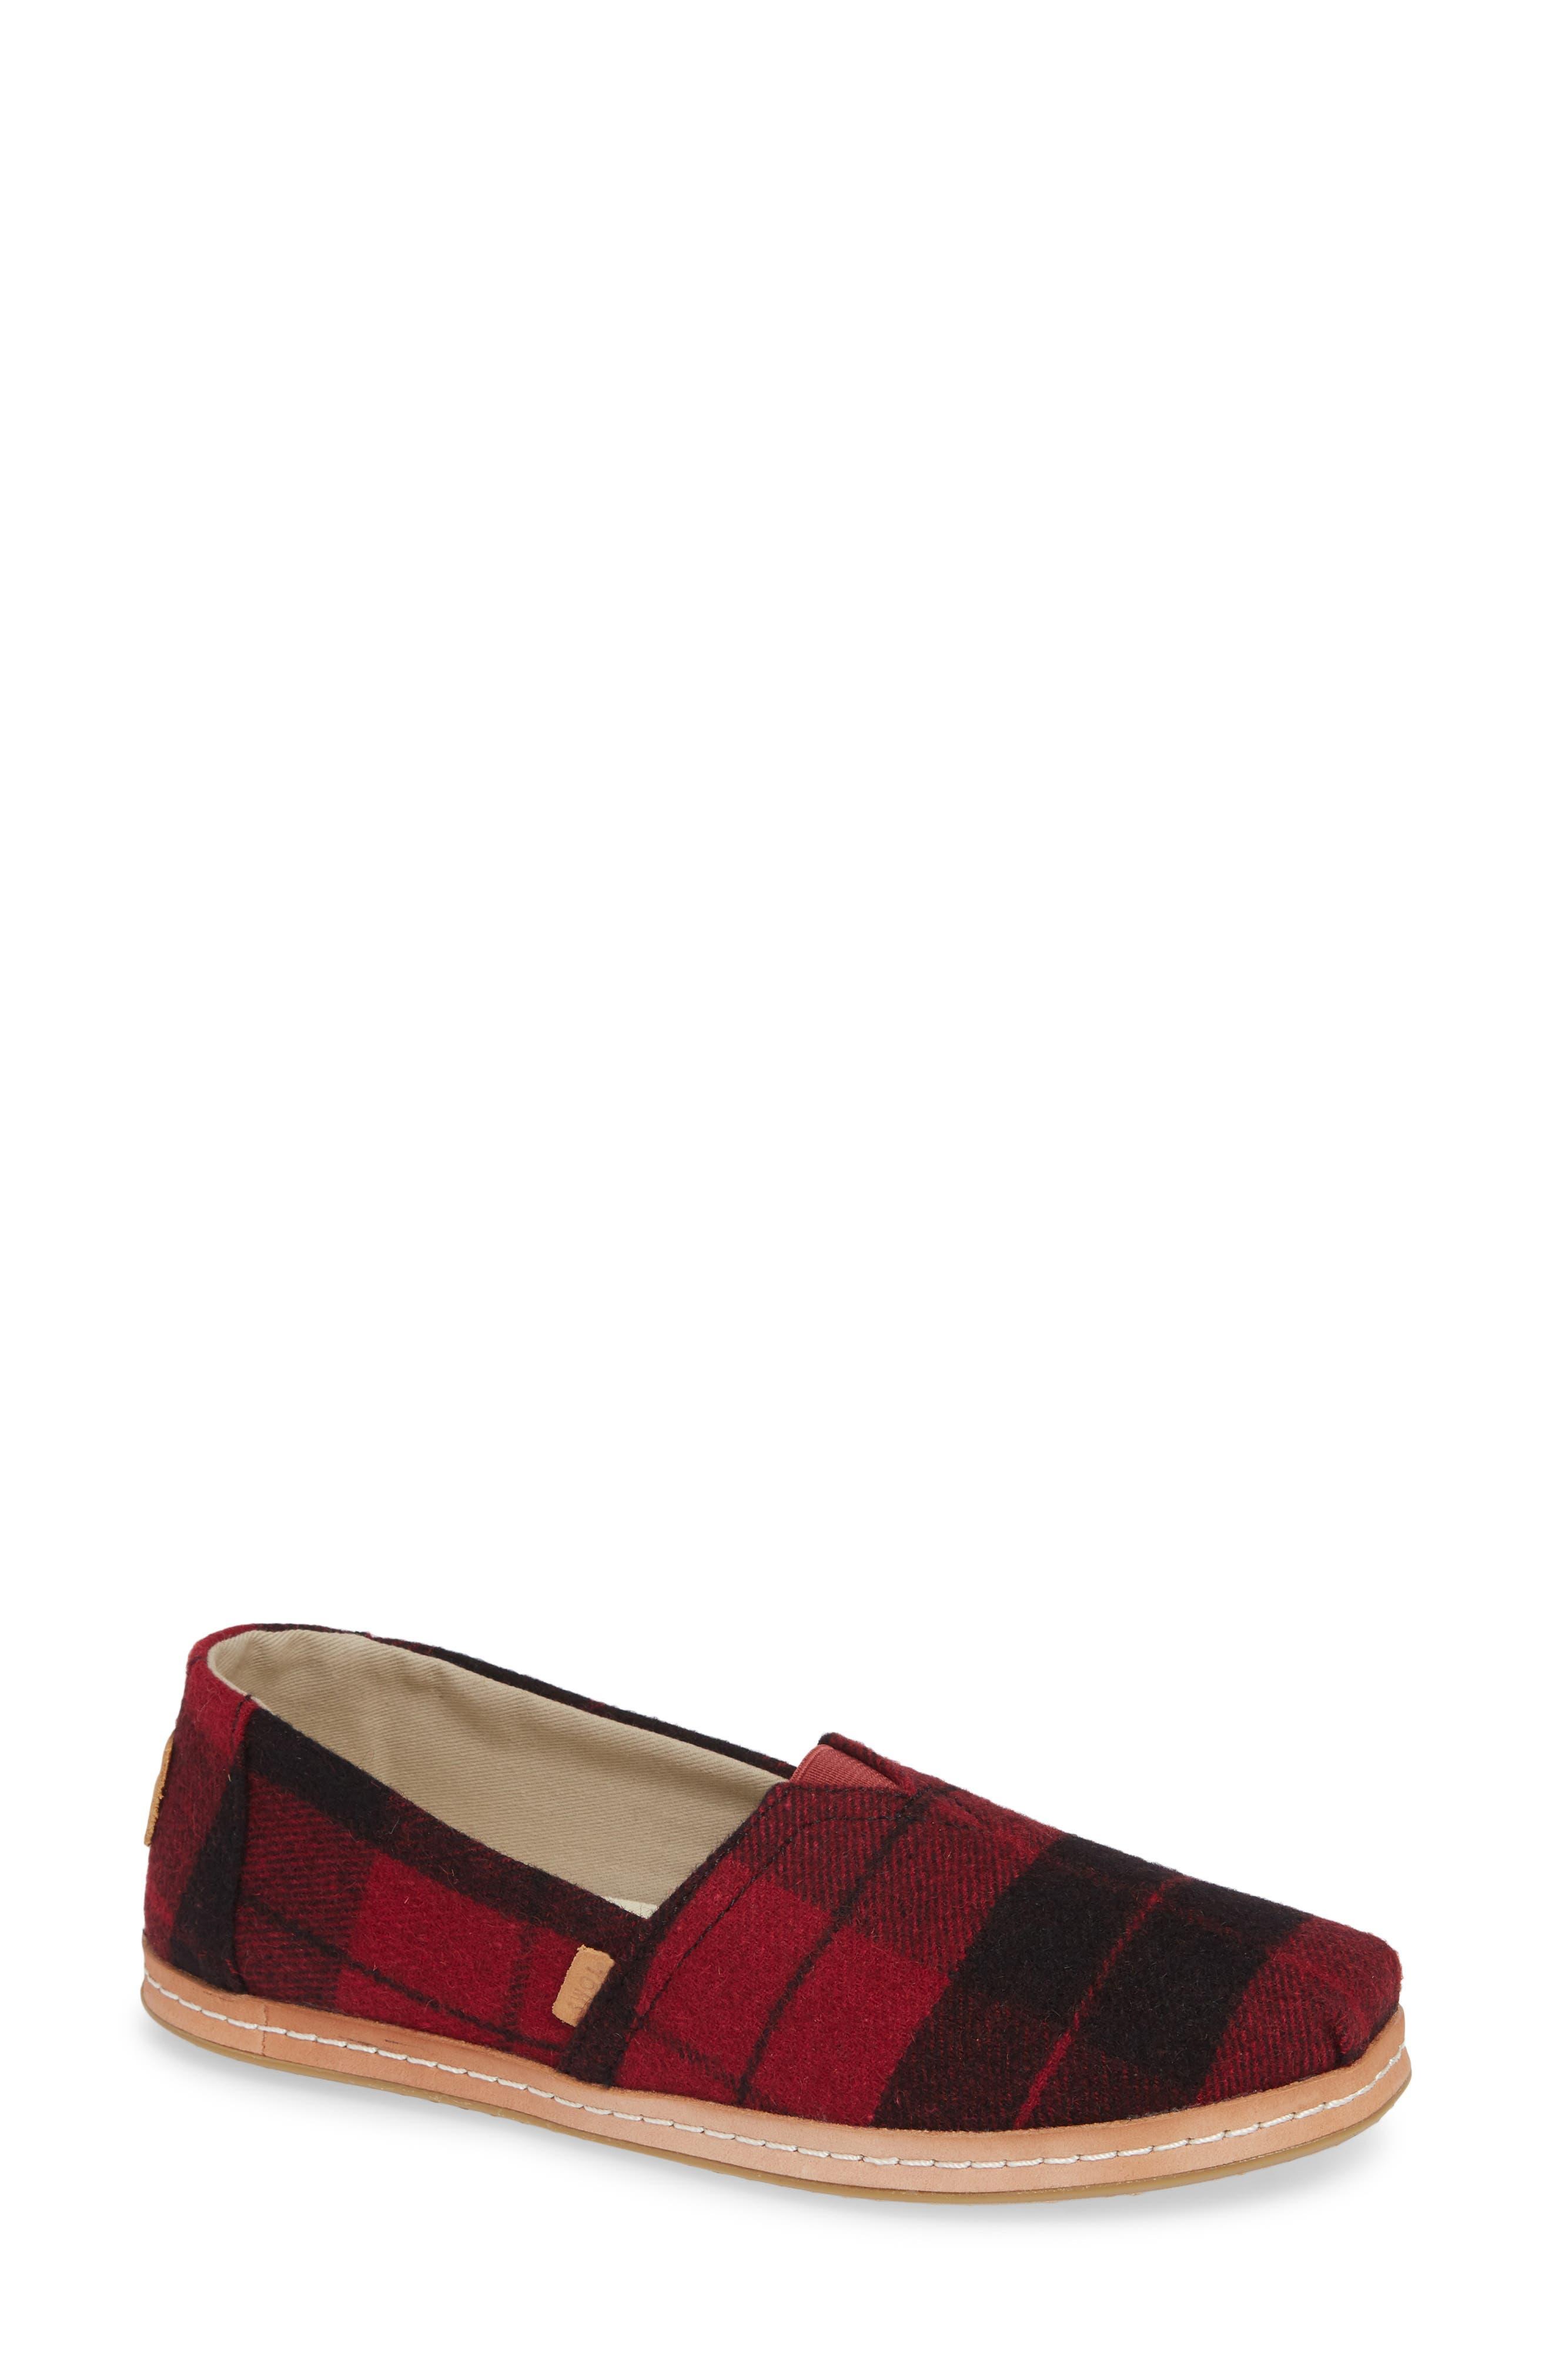 TOMS Classic - Alpargata Slip-On, Main, color, RED PLAID FABRIC